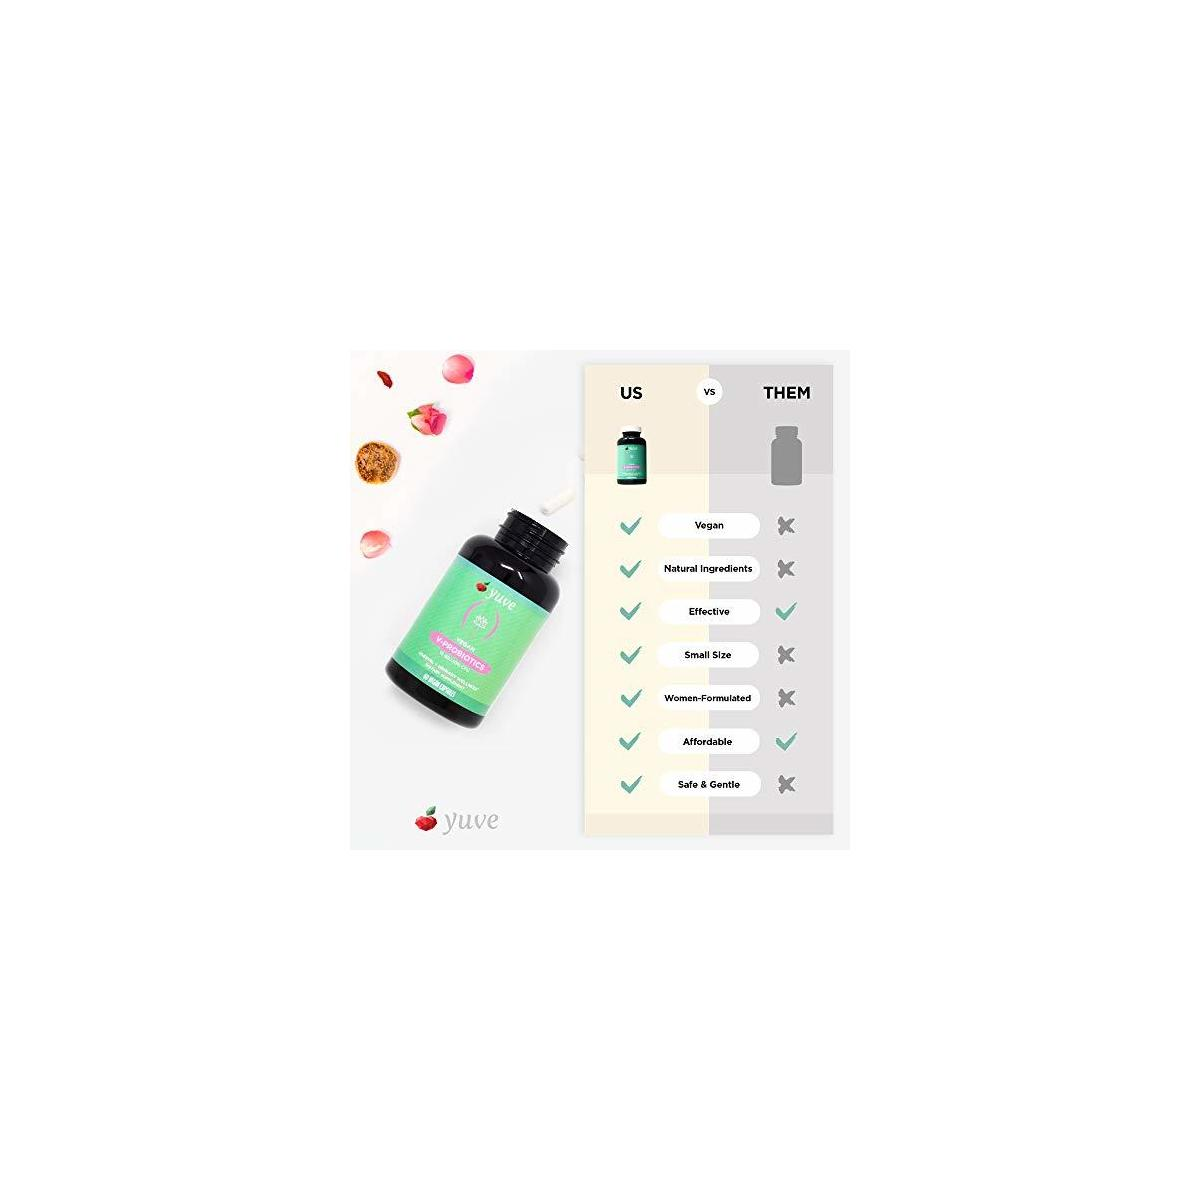 Yuve Vegan Probiotics Supplement for Women - Shelf Stable 15 Billion CFU - Supports Healthy Flora, Feminine Urinary Tract Wellness, Immune & Digestive Health - Non-GMO, Gelatin & Gluten Free - 60 ct